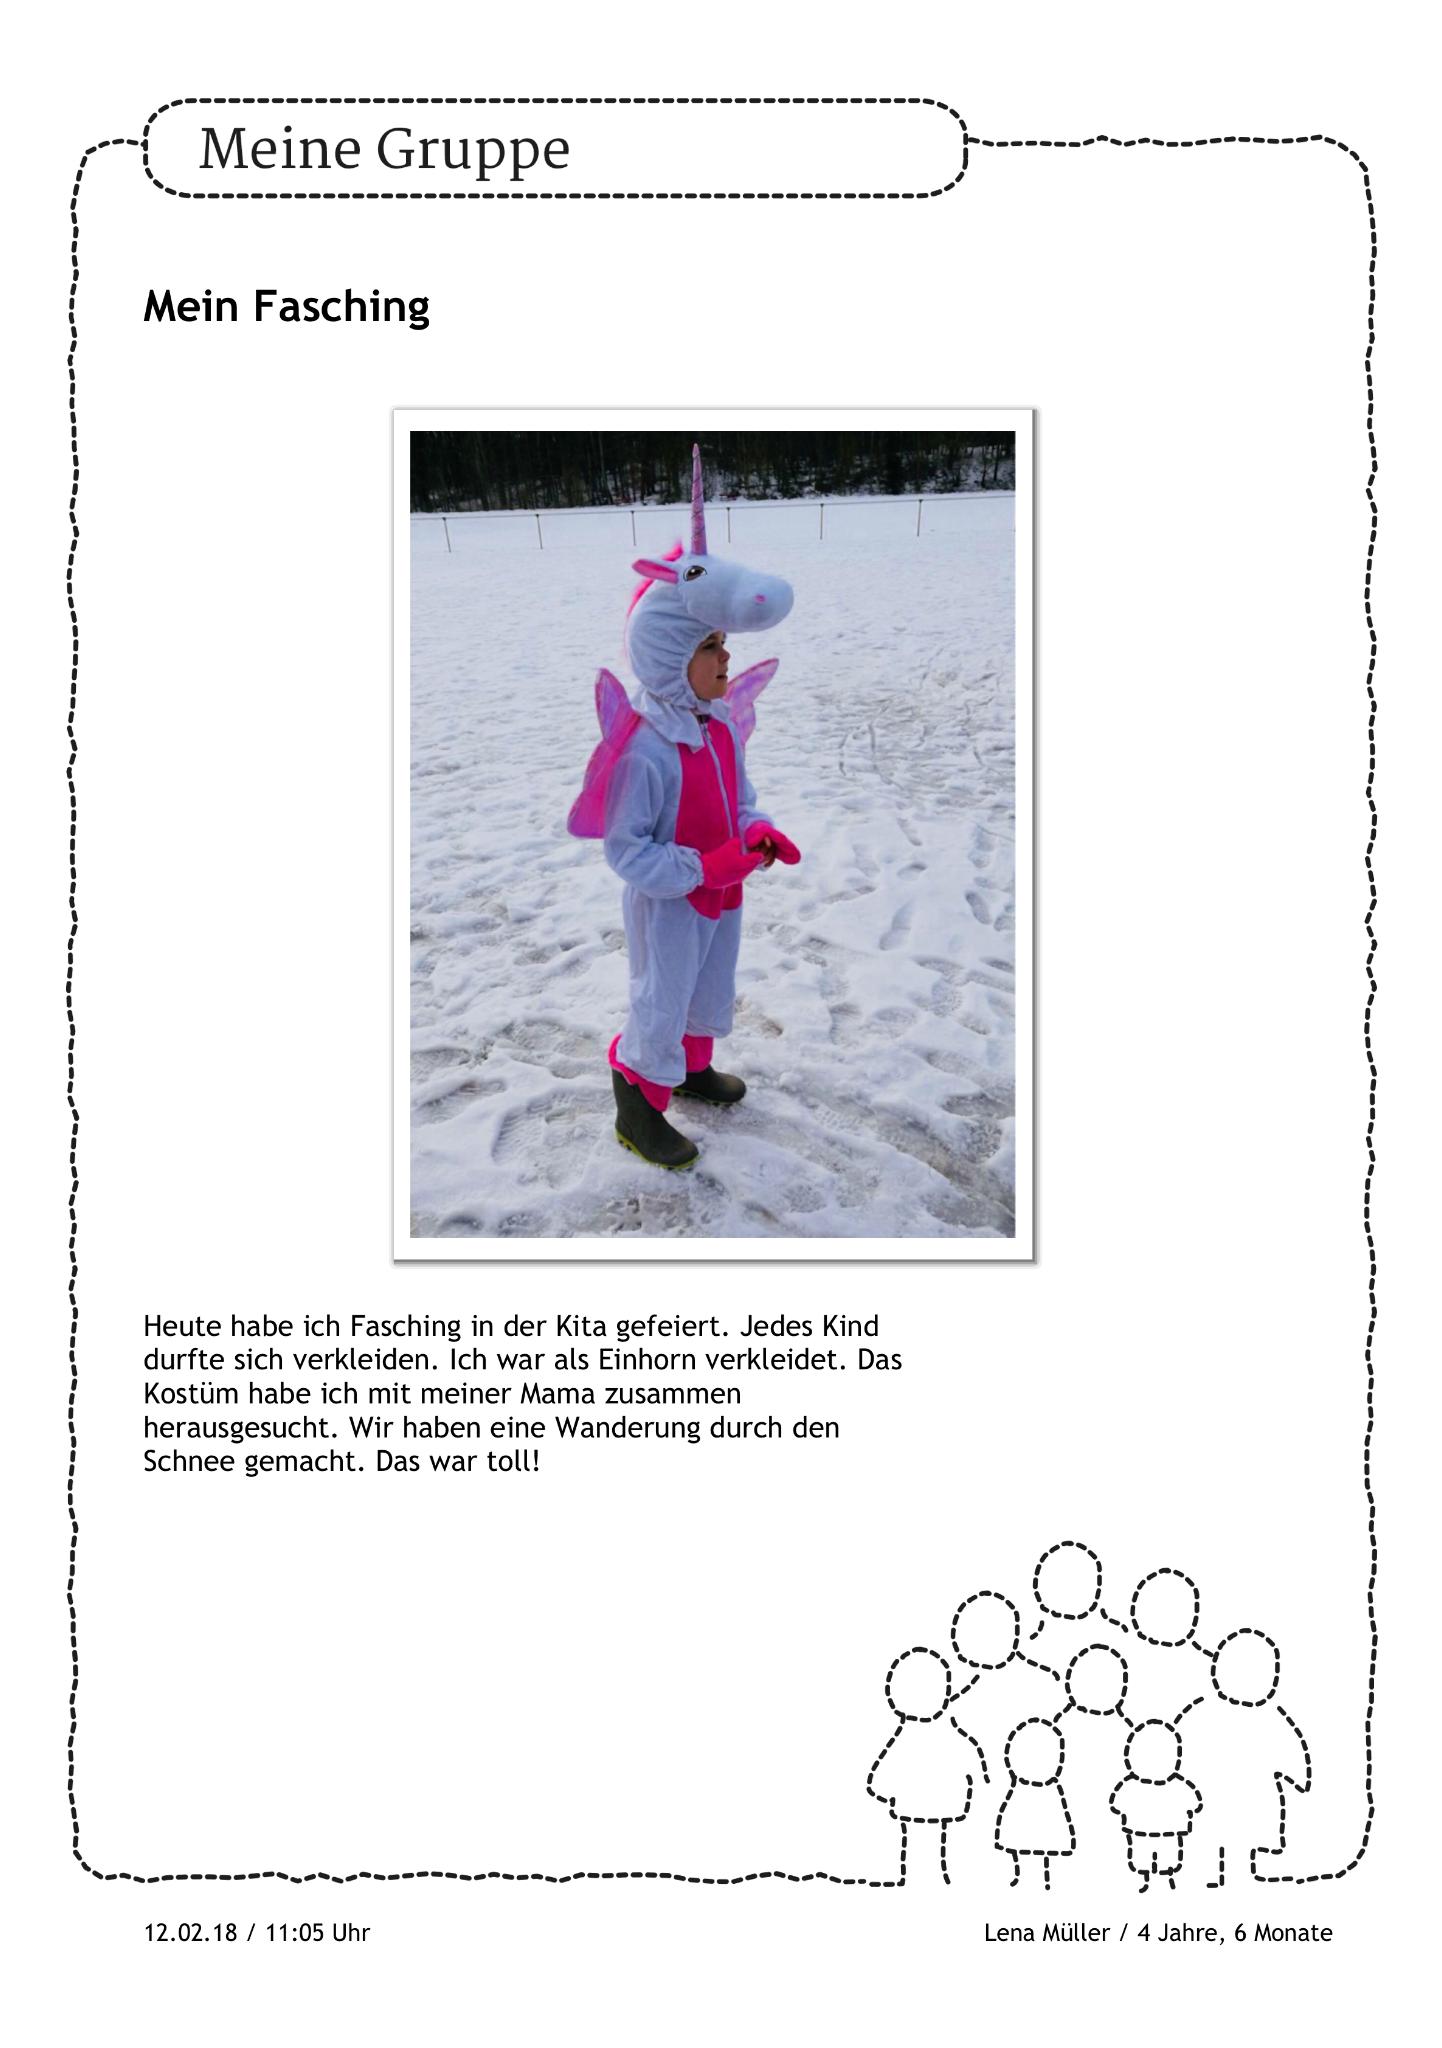 Karneval #Fasching #Fasnet #Kita #Kinder #Verkleidung #Spaß ...